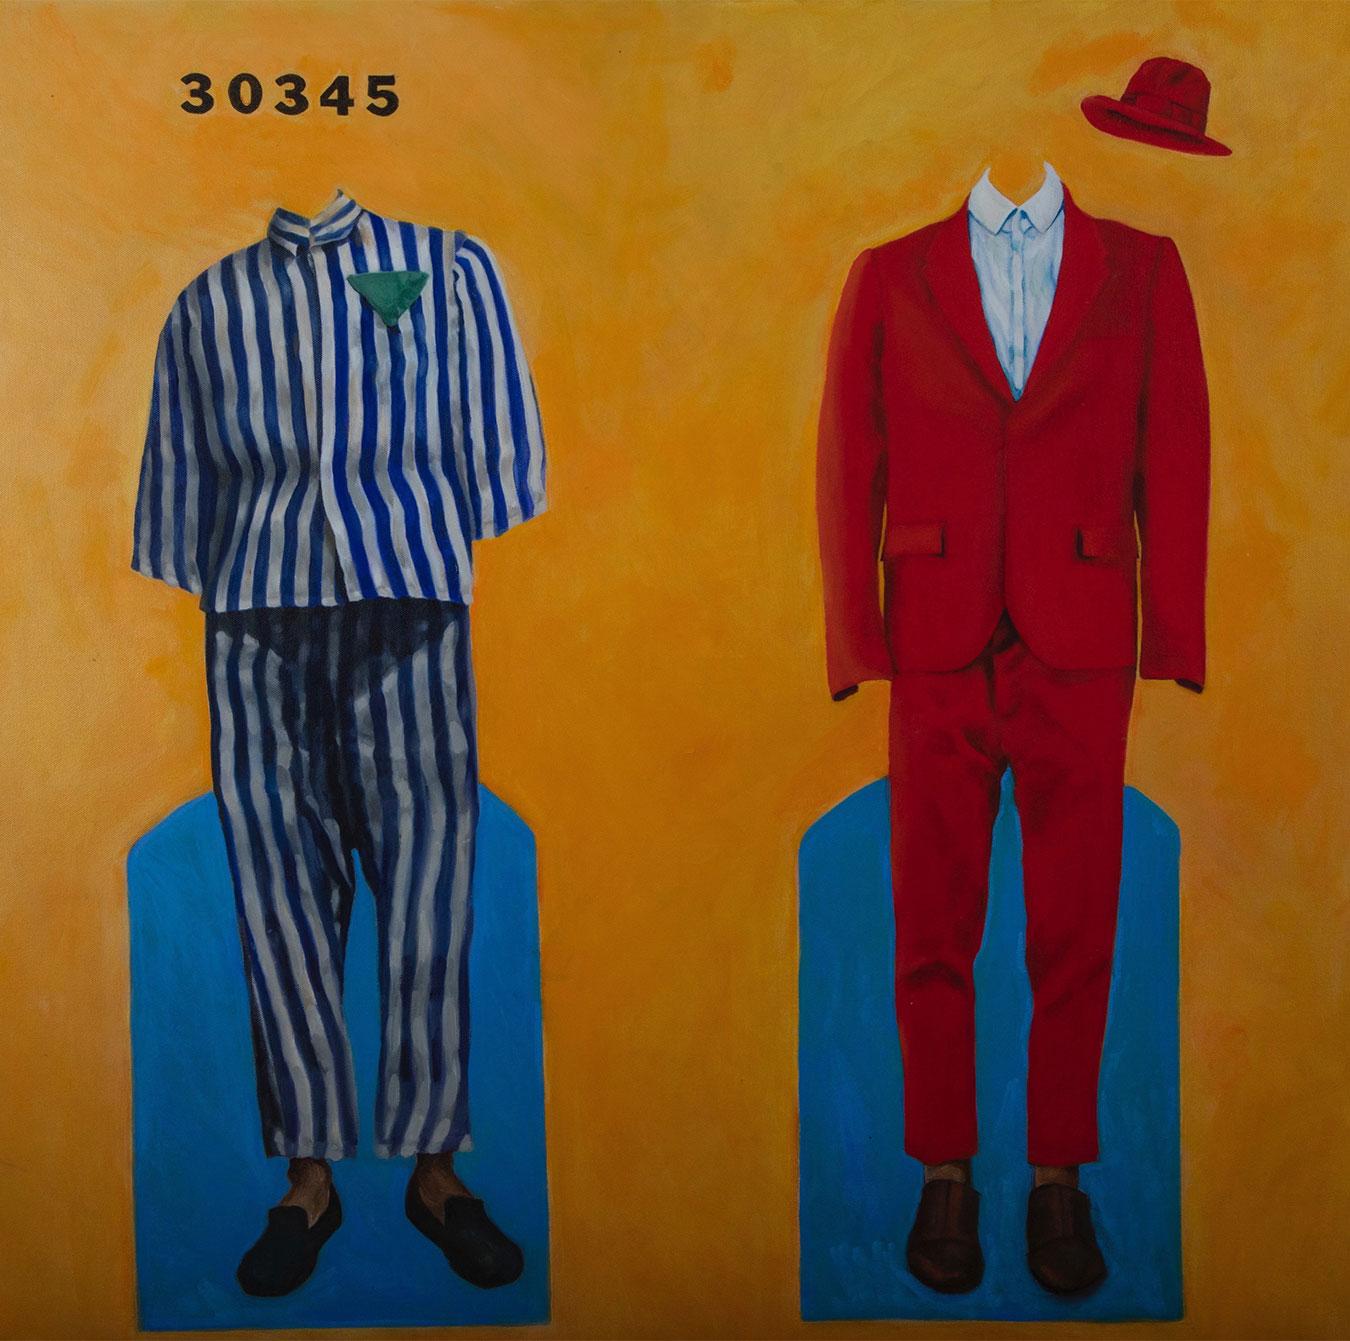 prisoner-of-war-and-suit.jpg